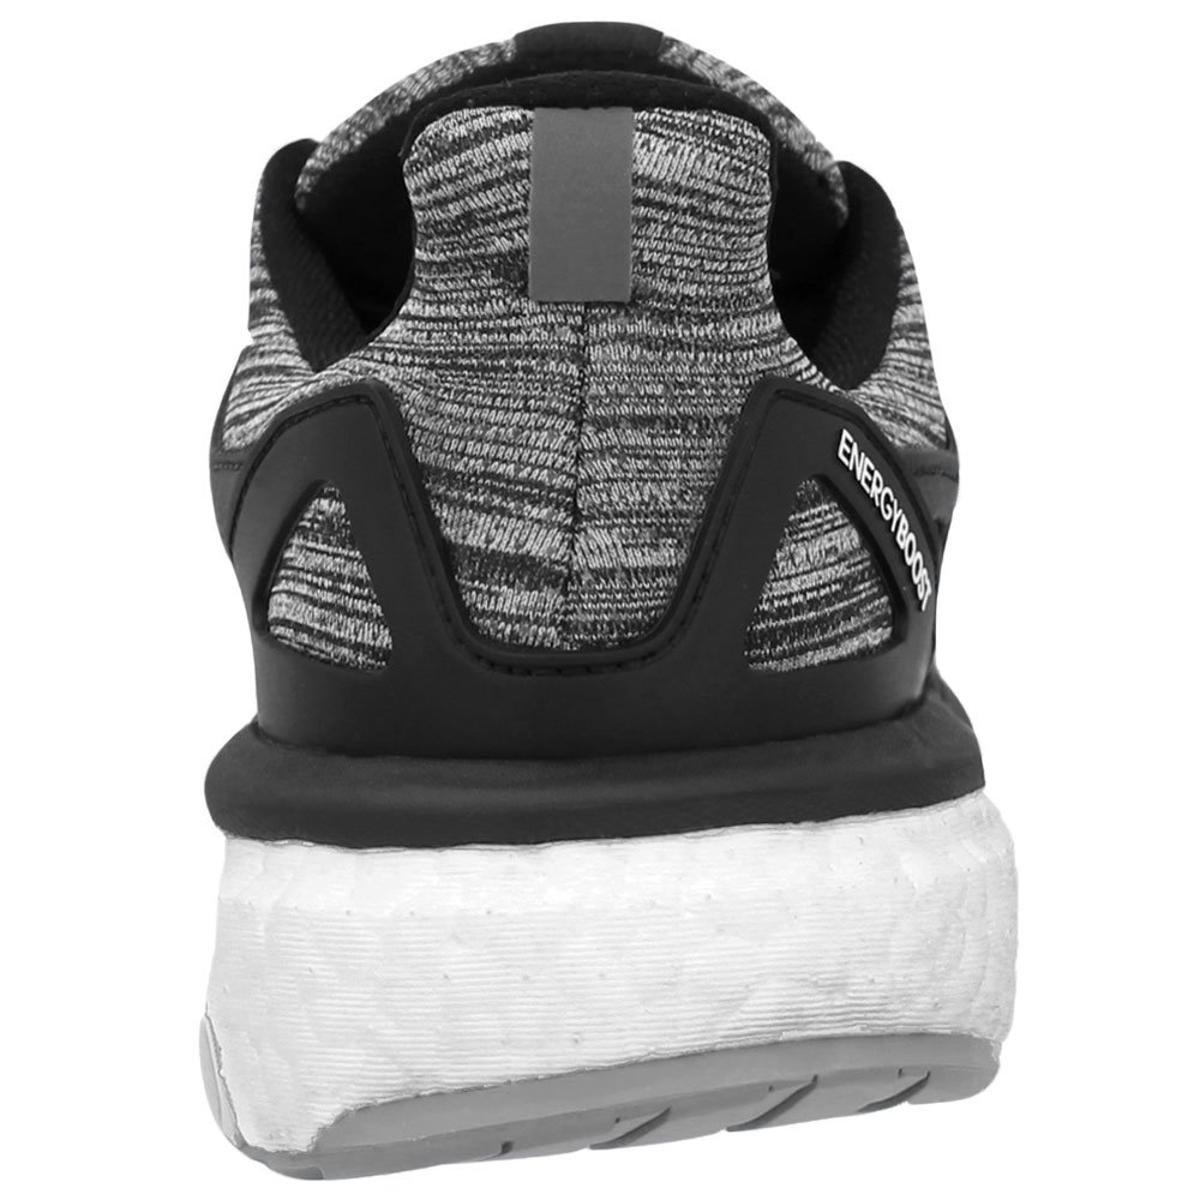 4a33a21682 Tênis Adidas Energy Boost Feminino  Tênis Adidas Energy Boost Feminino ...